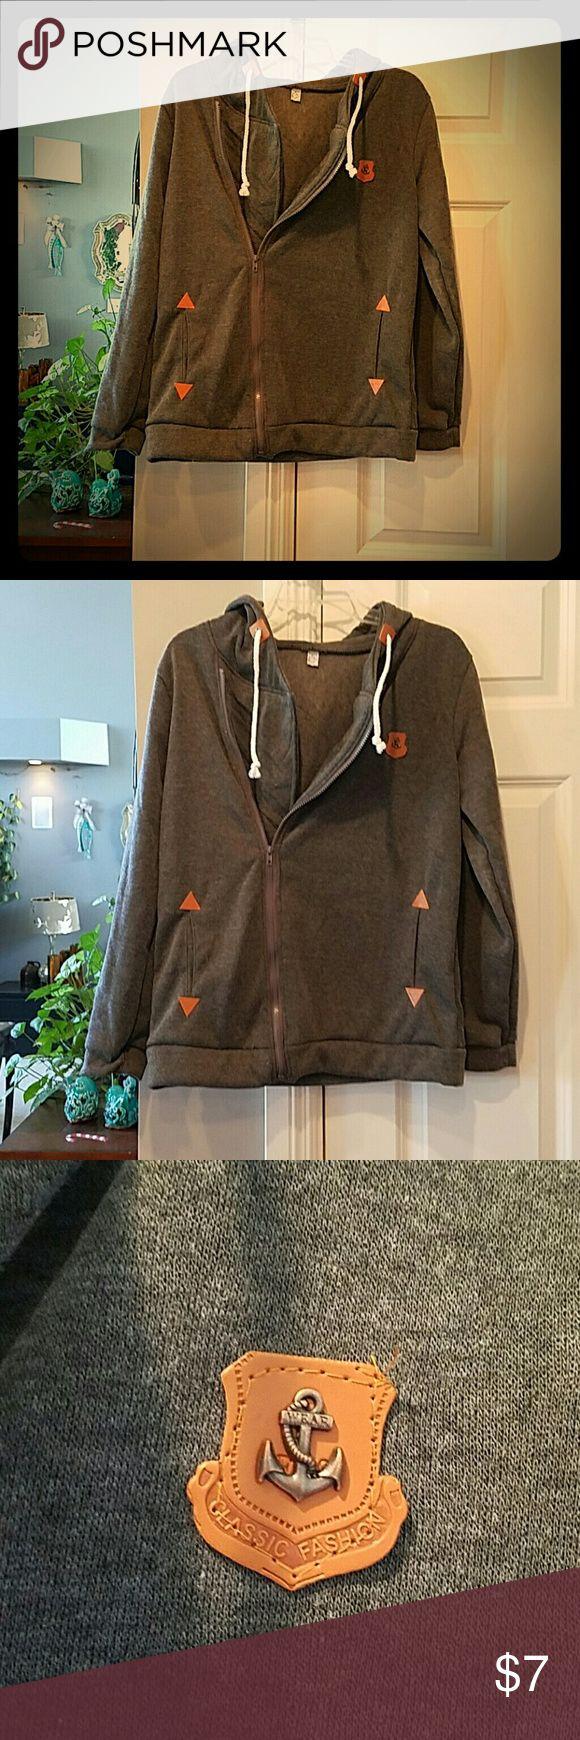 KXUAN/Nautical Theme Womens Hooded sweatshirt BRAND NEW! PERFECT CONDITION! WARM AND COZY AND CUTE ! WOMEN'S MEDIUM. /Large.  KXUAN  #GREATDEAL  #SUPERSOFT  #UWILLLOOKMARV KXUAN  Tops Sweatshirts & Hoodies